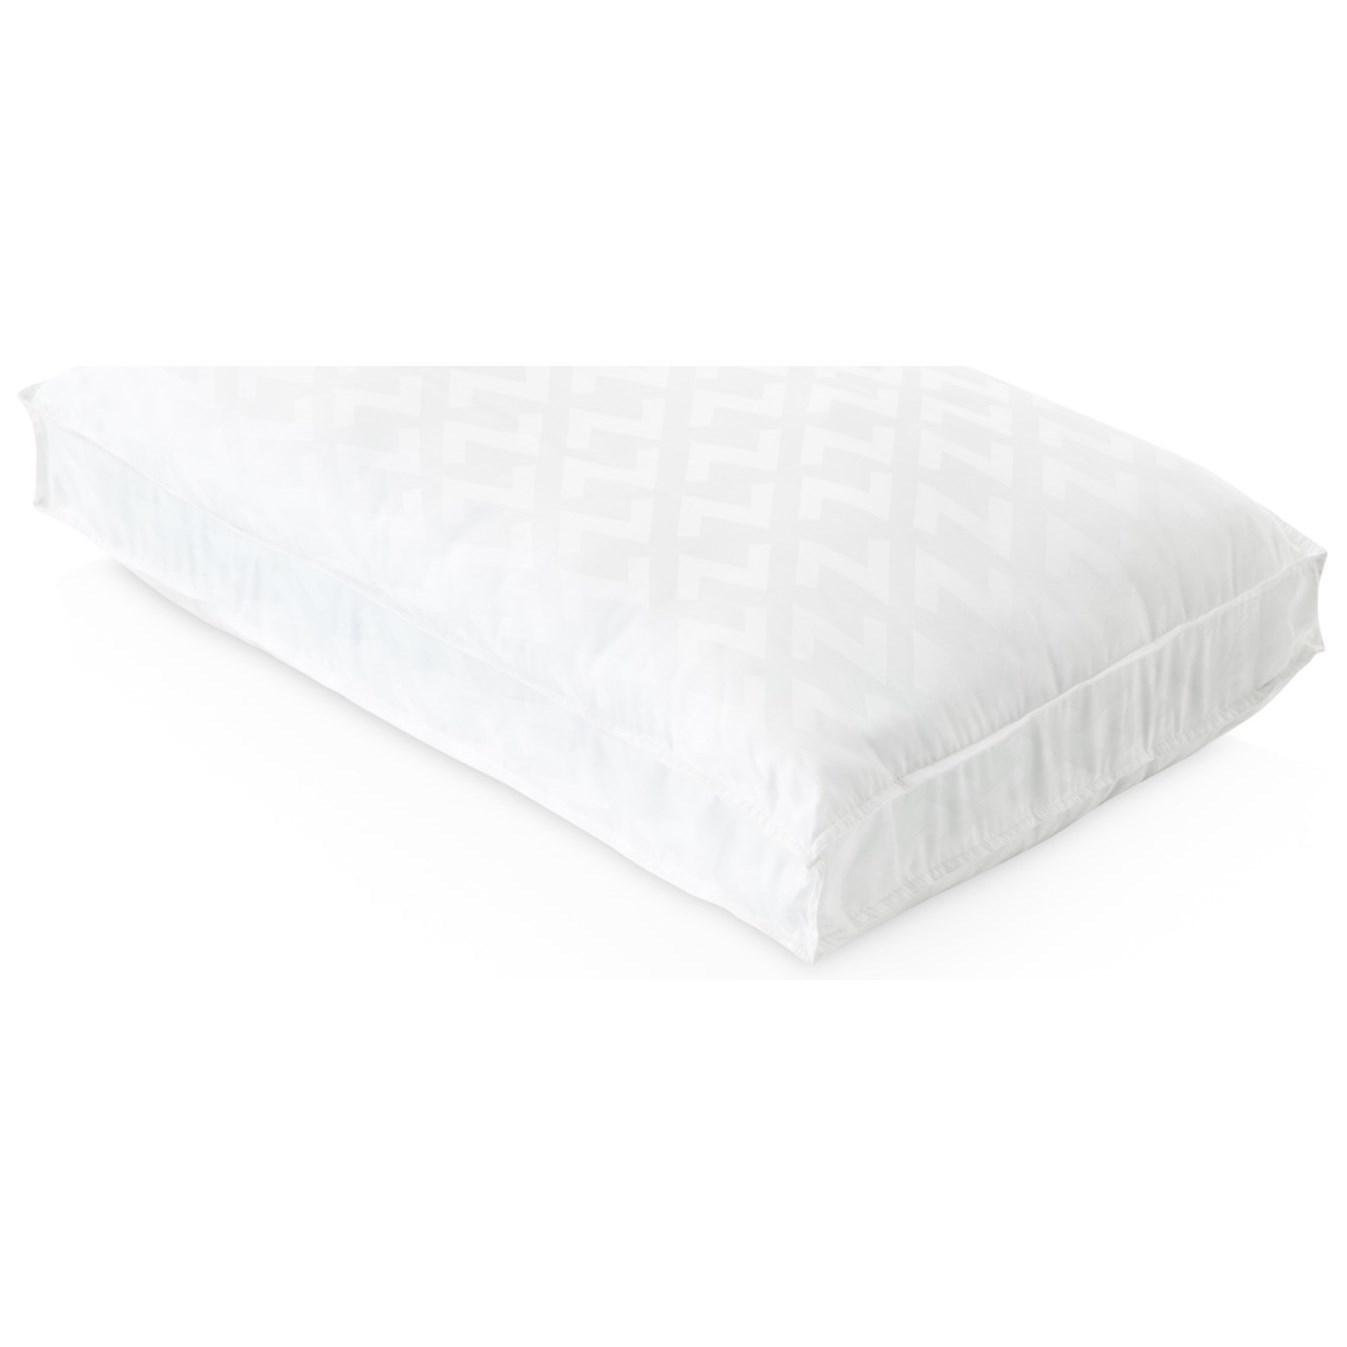 Malouf Gel Convolution™ King Gel Convolution™ High Loft Pillow - Item Number: ZZKKHPCOGF